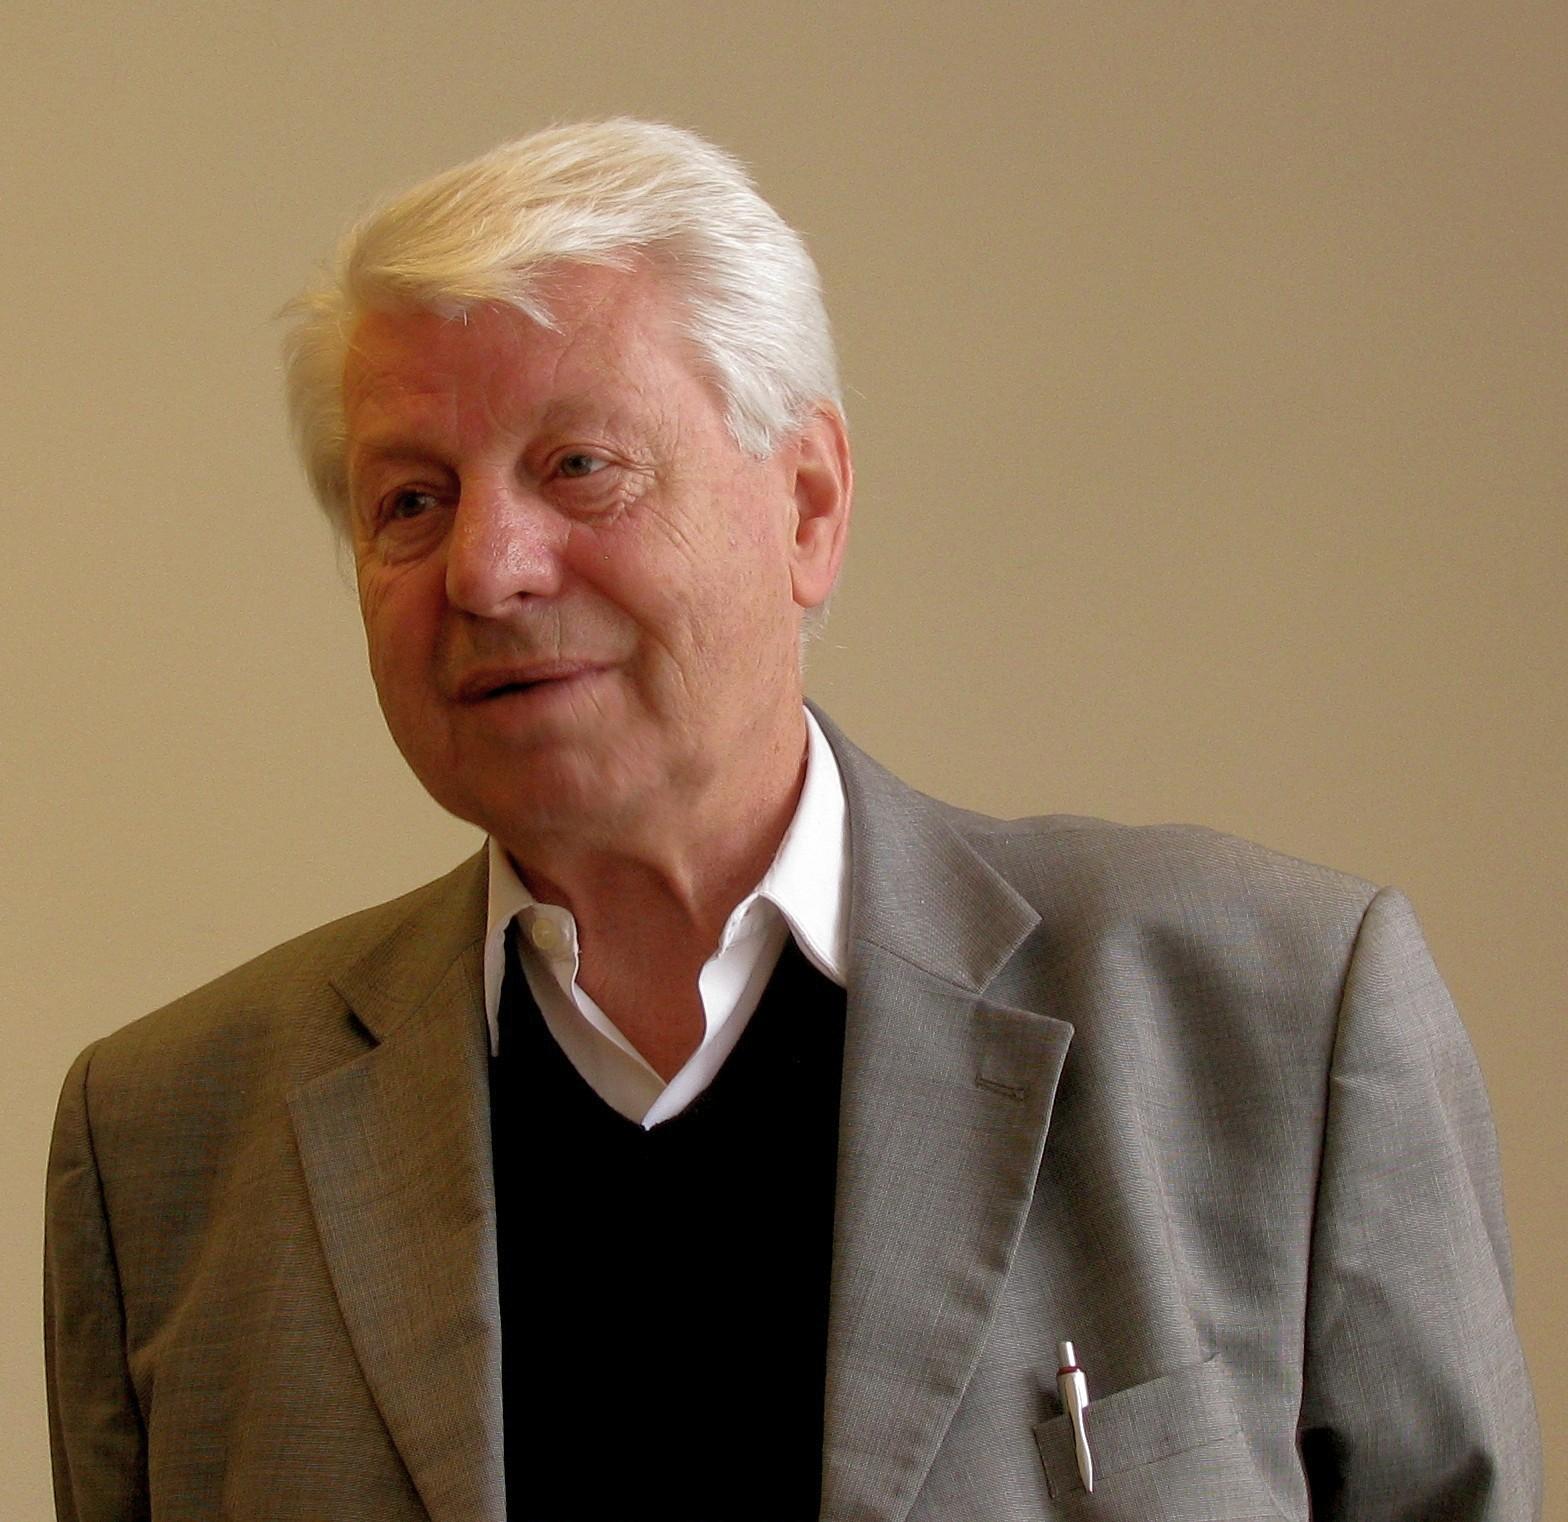 Petr Vopěnka in 2009